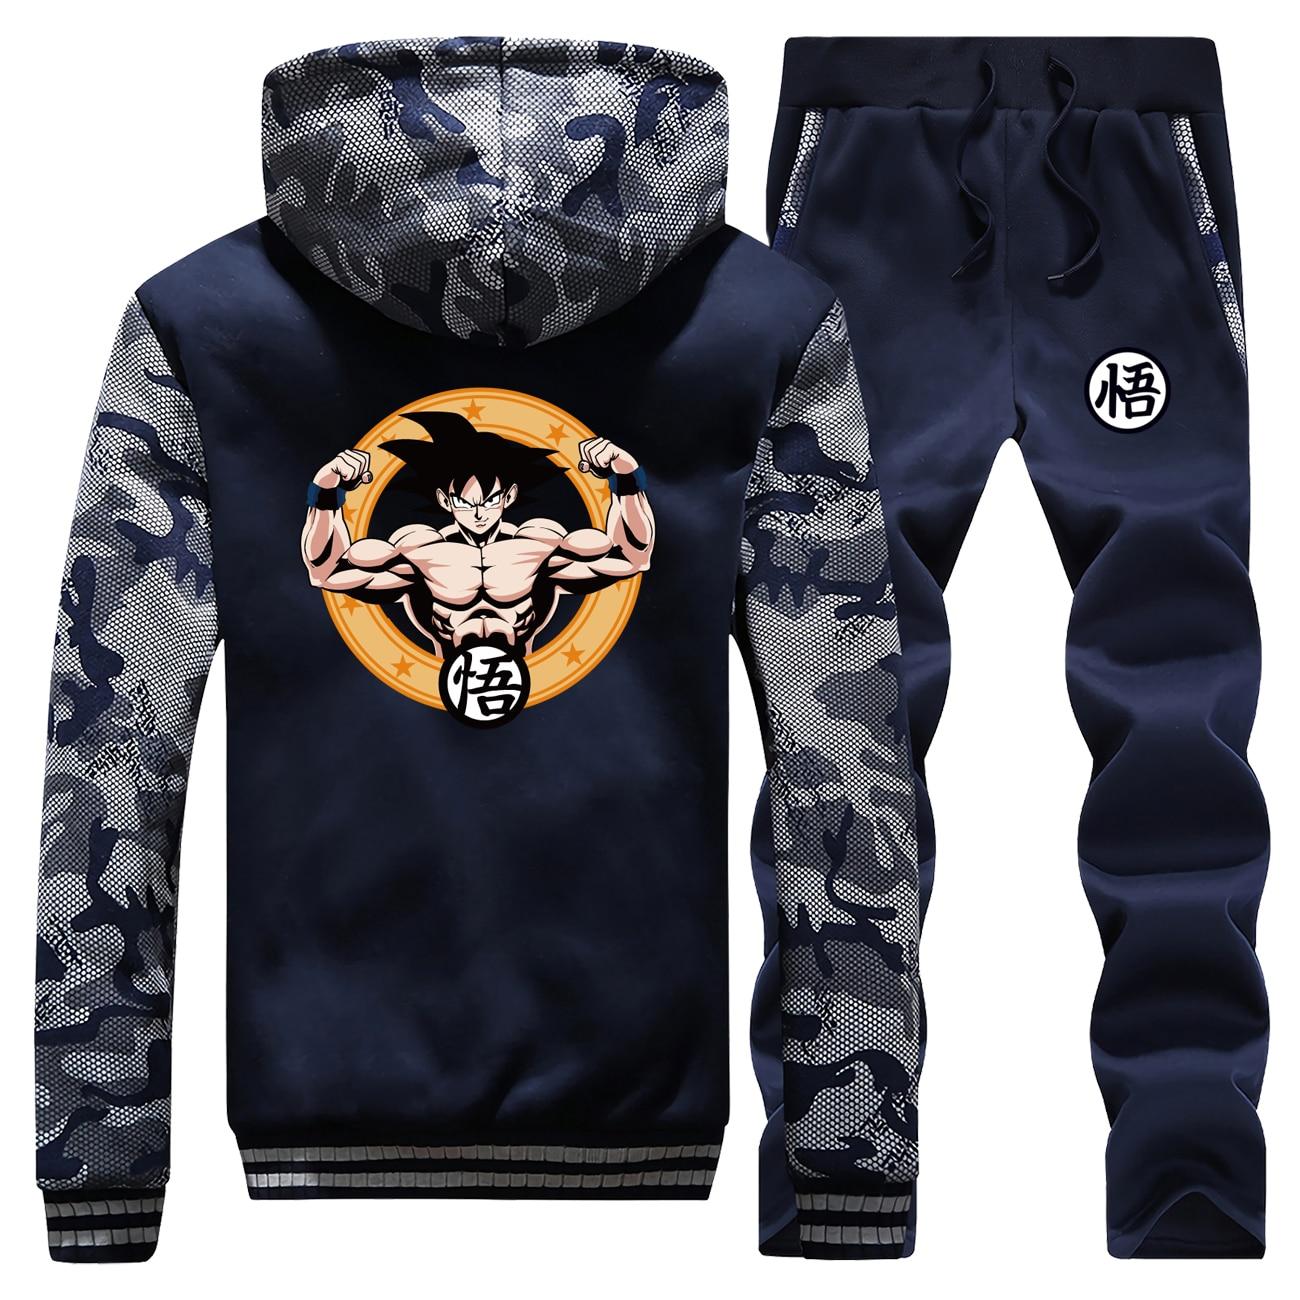 Fashion Japane Anime Dragon Ball Saiyan Men Camo Sweatshirt Hoodies Men's Hoodies+Pants Sets Winter Fleece Sportswear Sweatpants